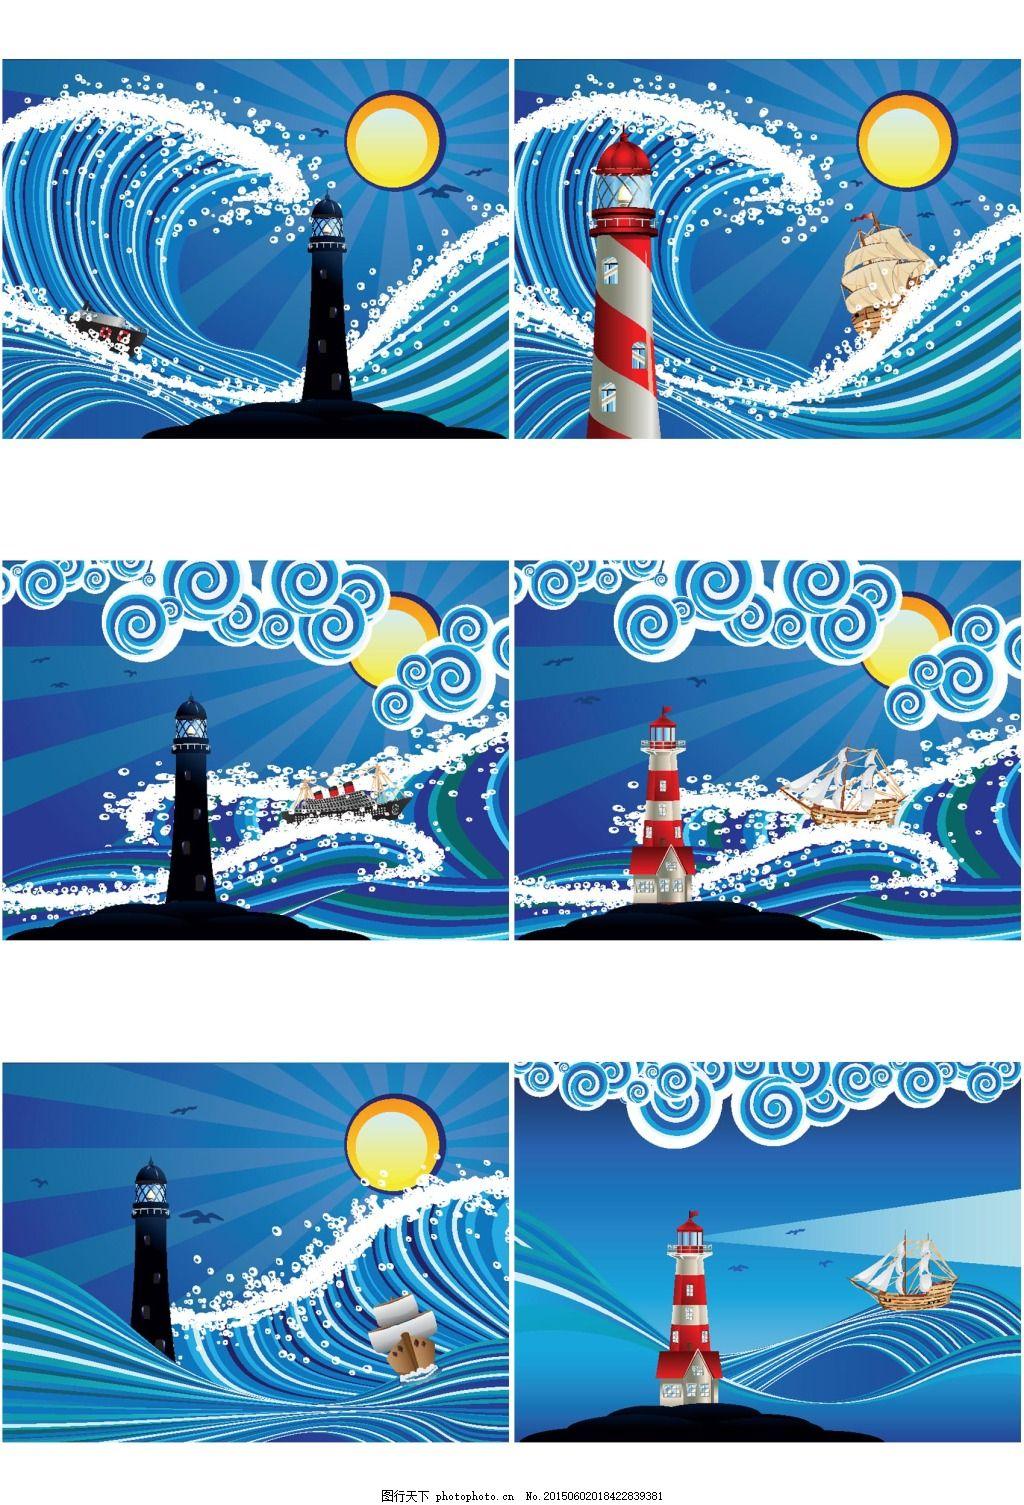 大海帆船和灯塔